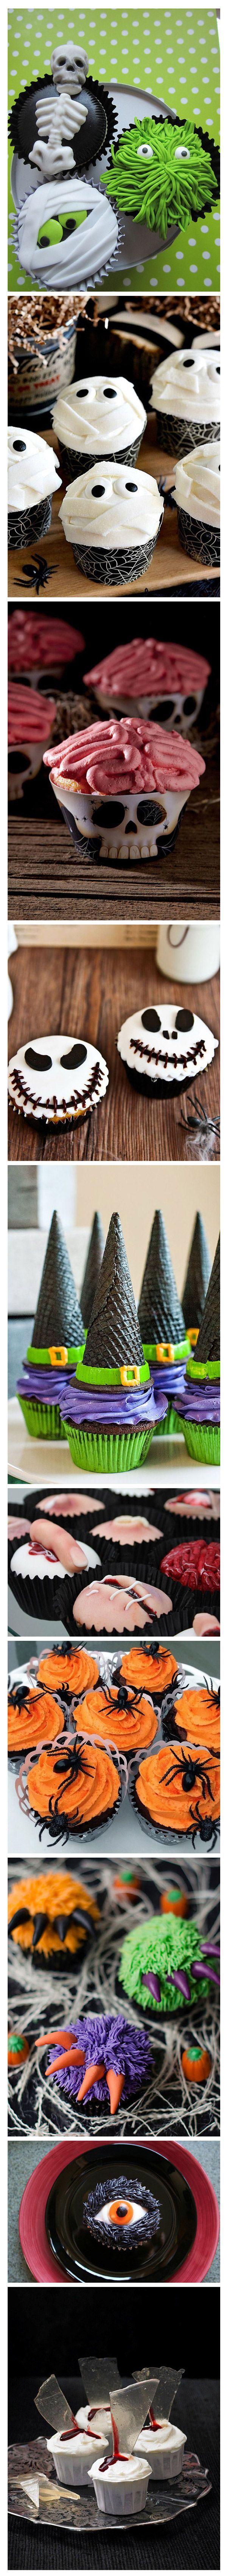 Cupcakes de Halloween | https://lomejordelaweb.es/